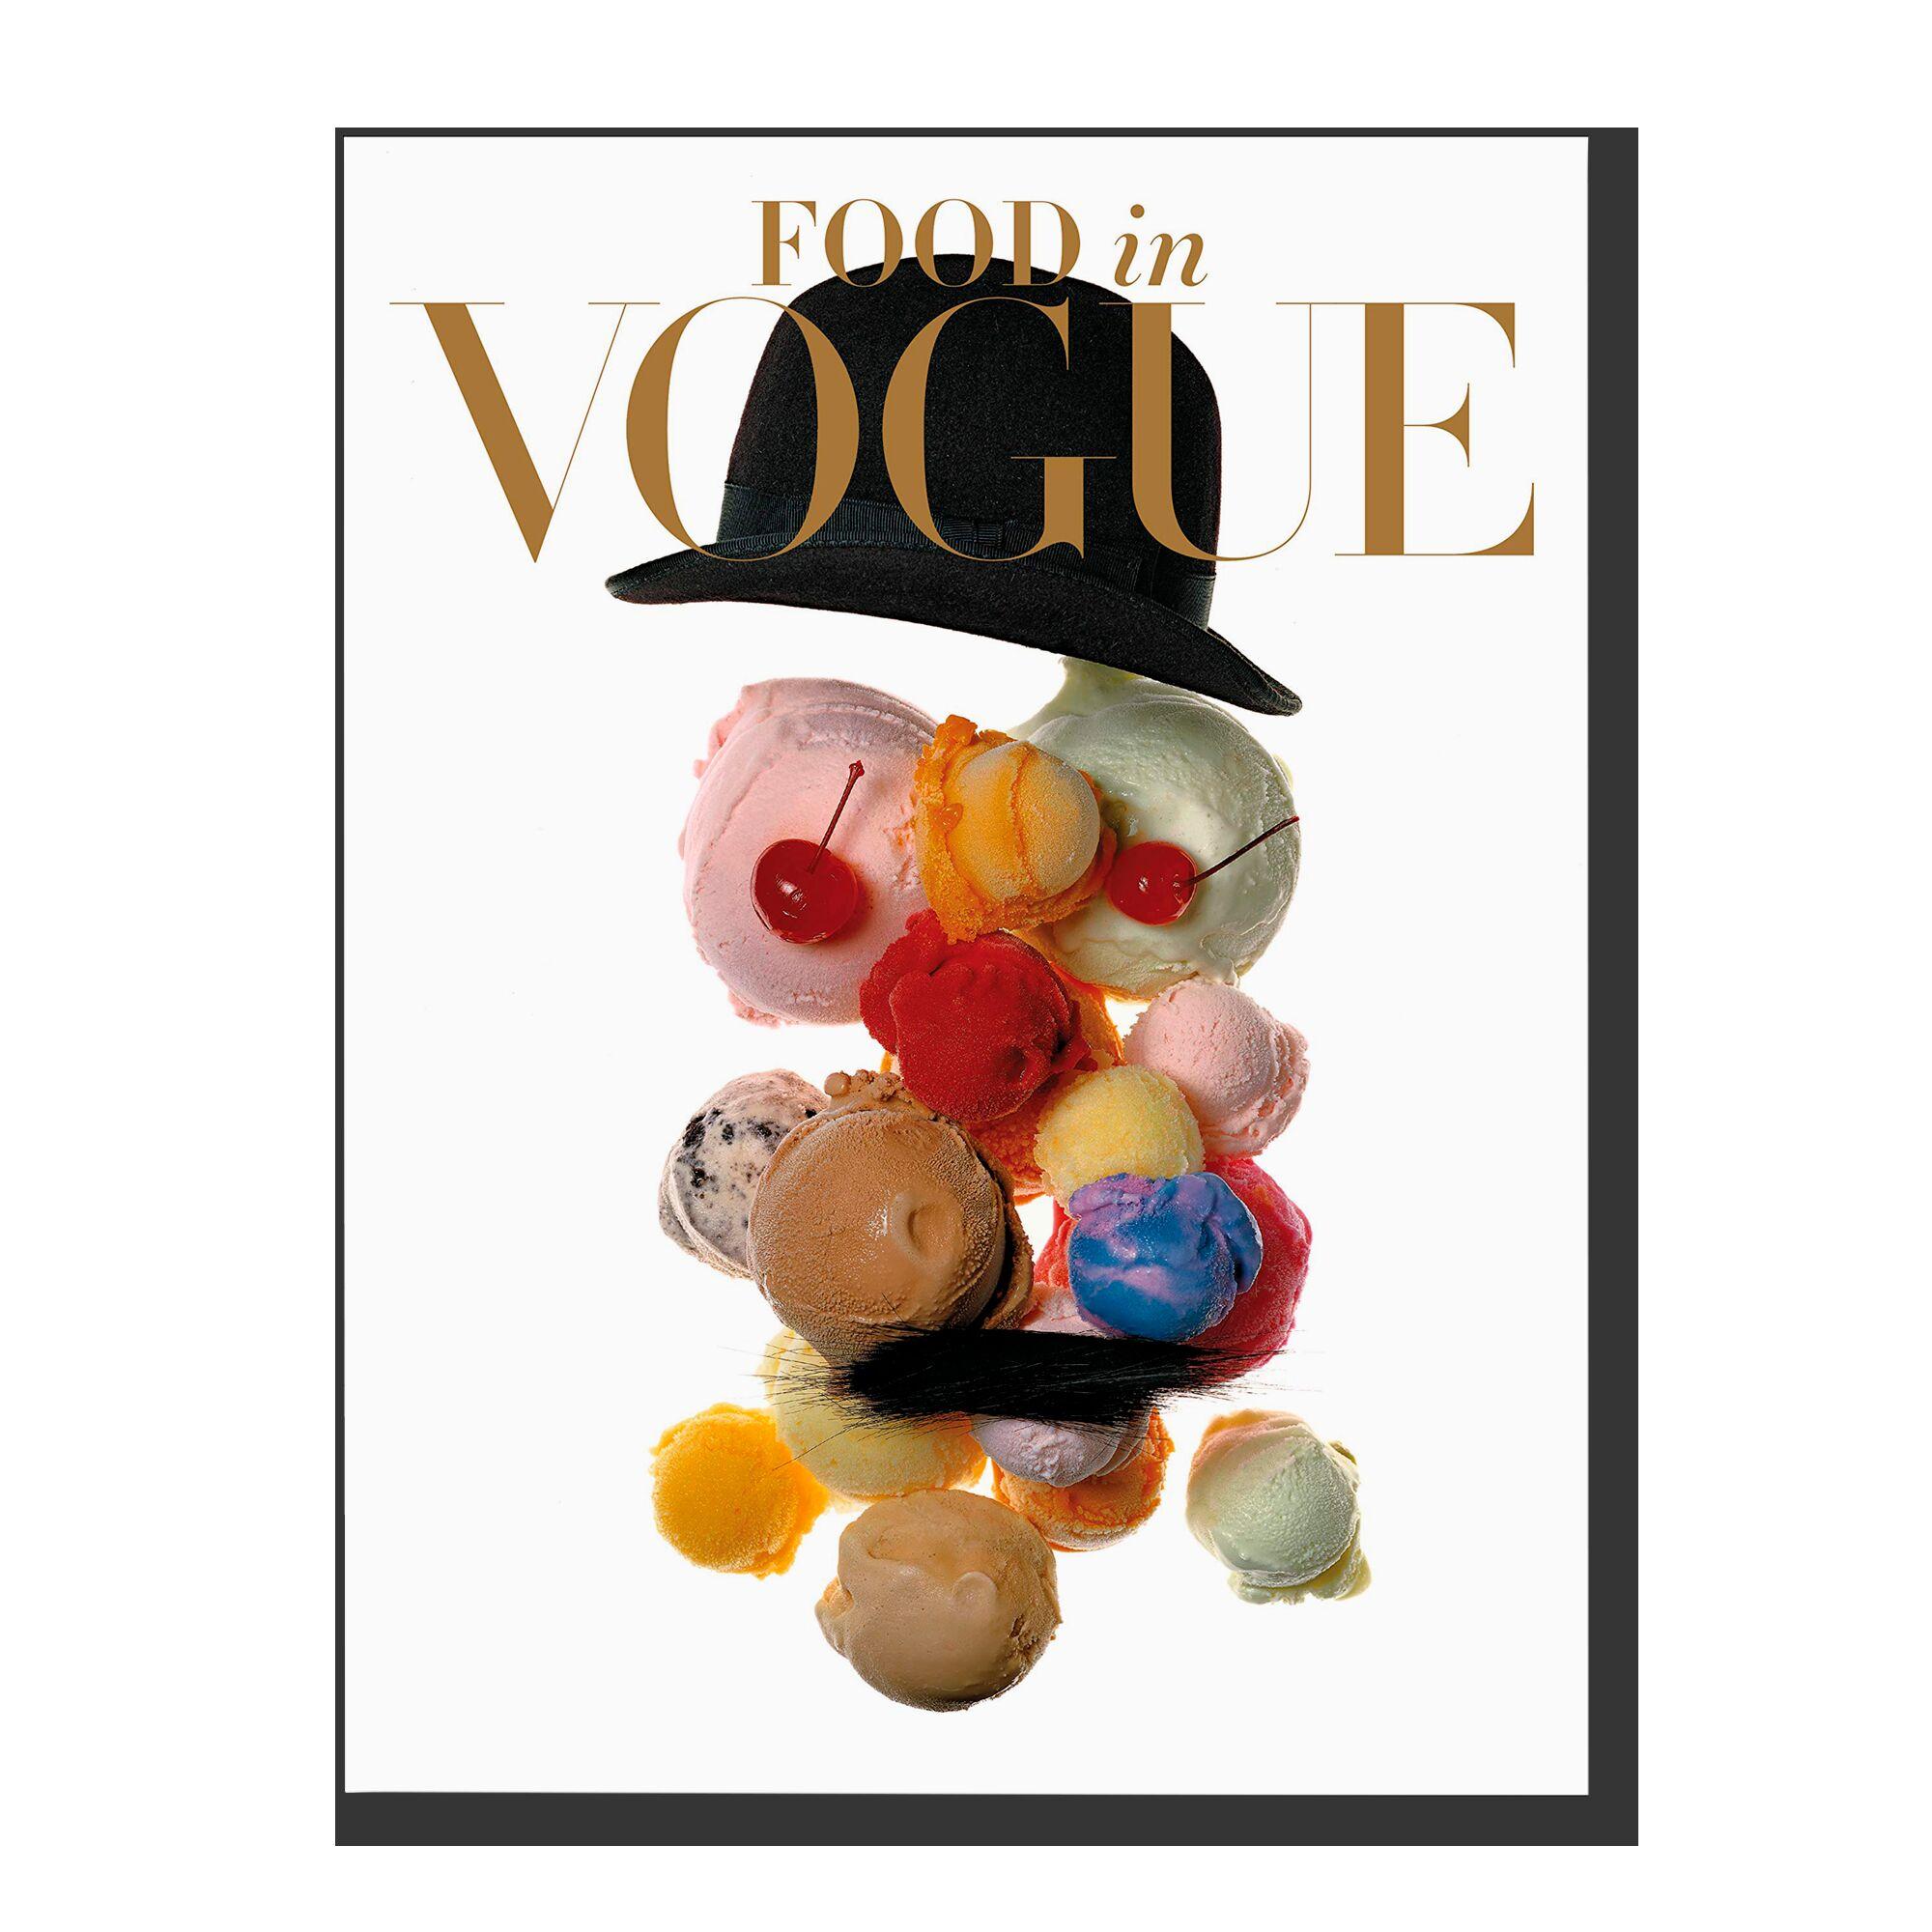 Food in Vogue